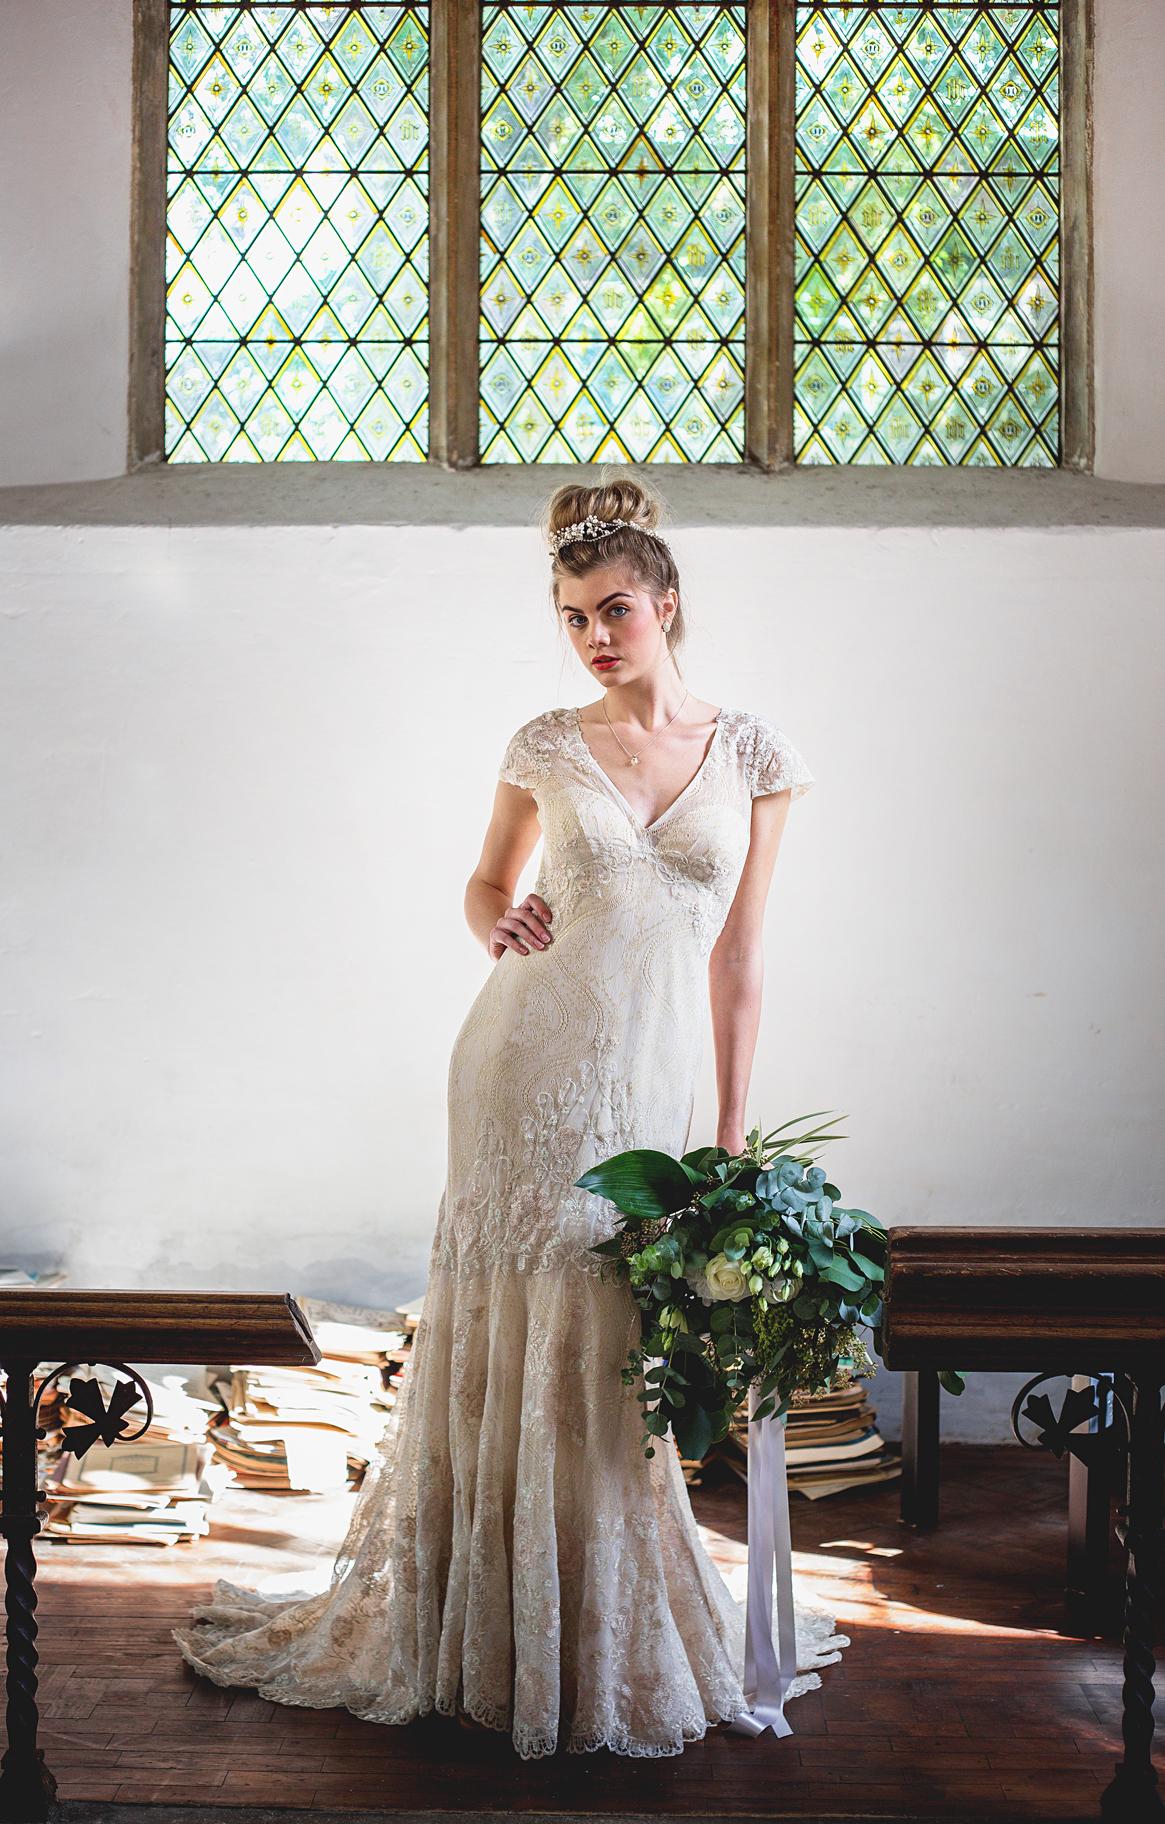 norfolk_wedding_photographer _norwich_anglia_documentary_reportage_storybook (12).jpg